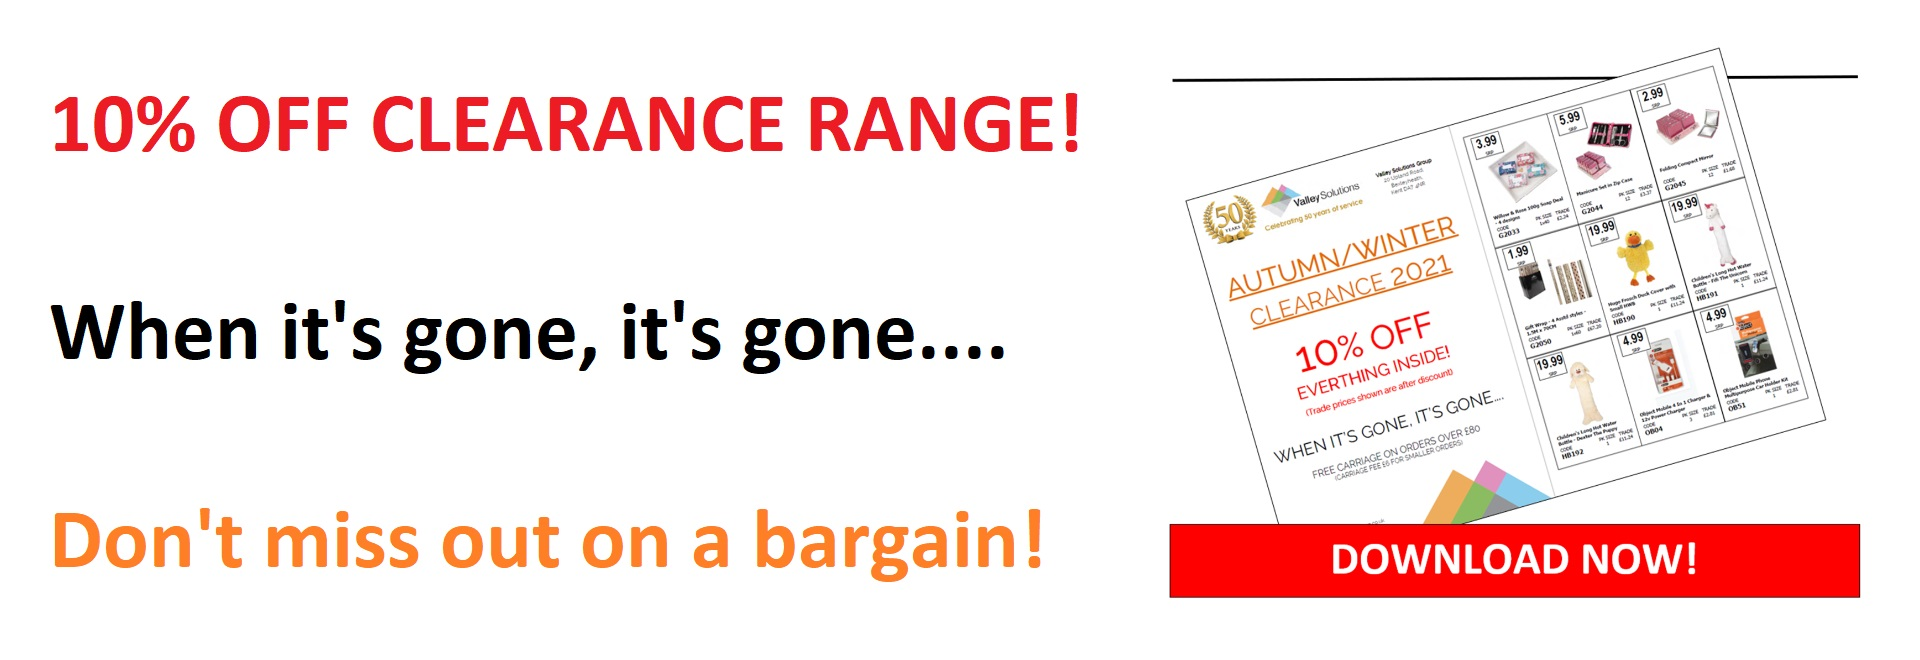 10% off Clearance Range